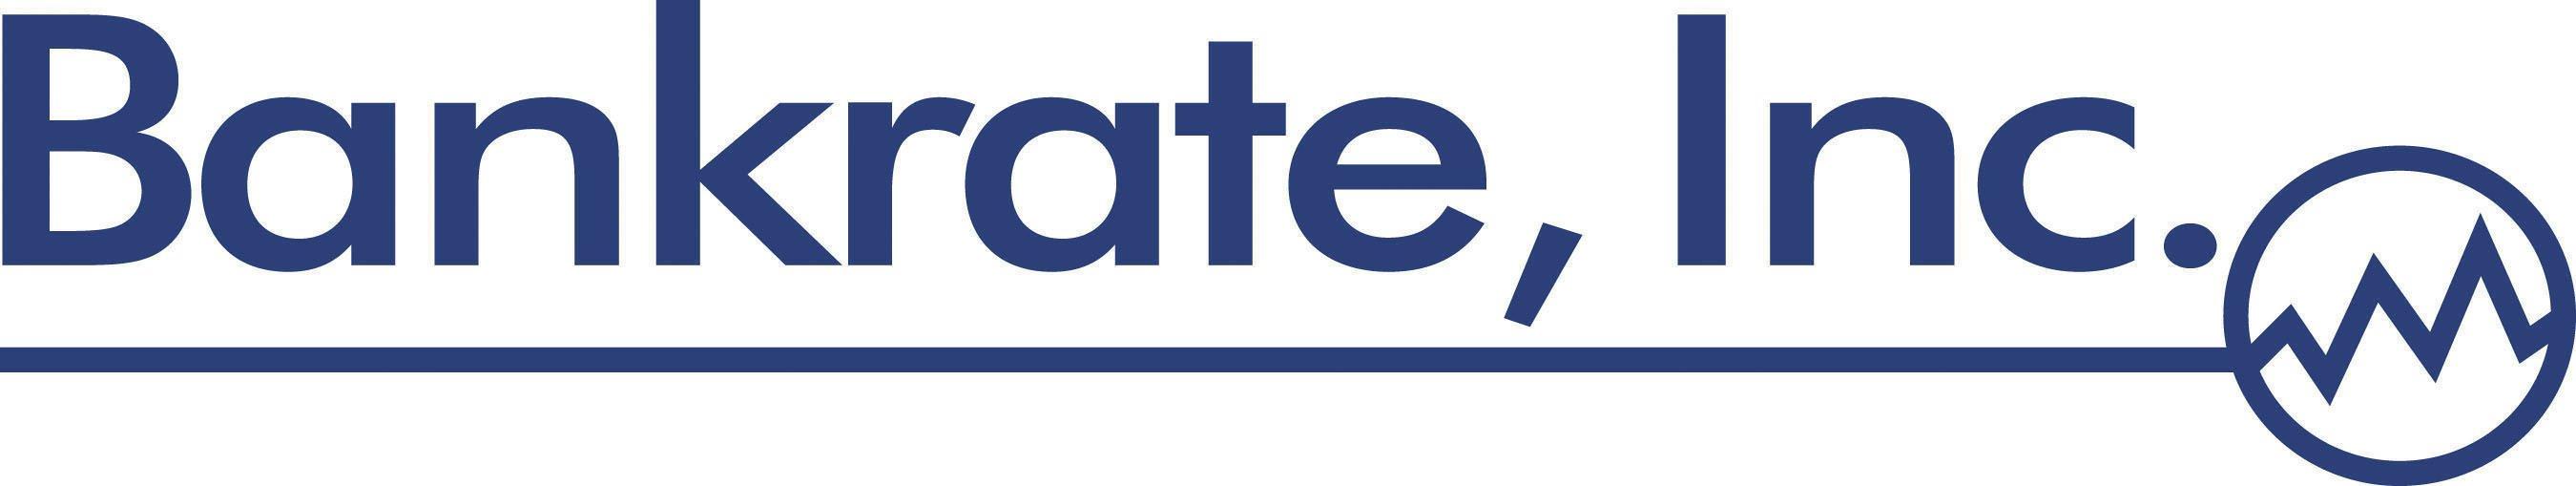 Bankrate.com Logo photo - 1